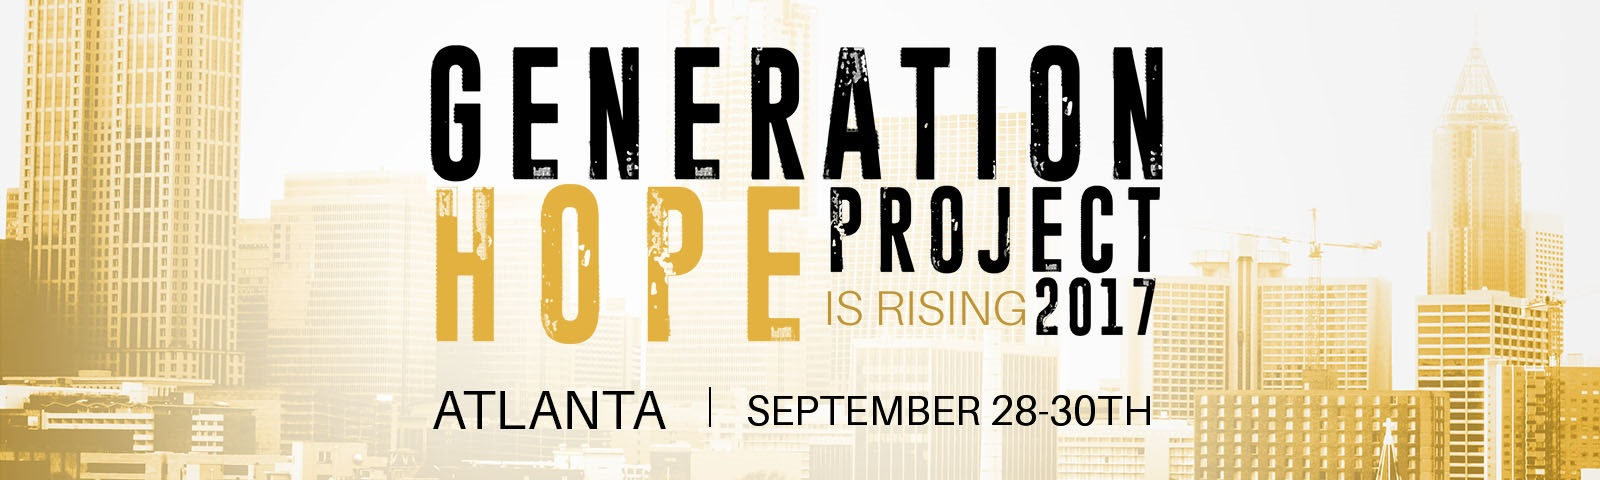 Generation Hope Project Atlanta 2017